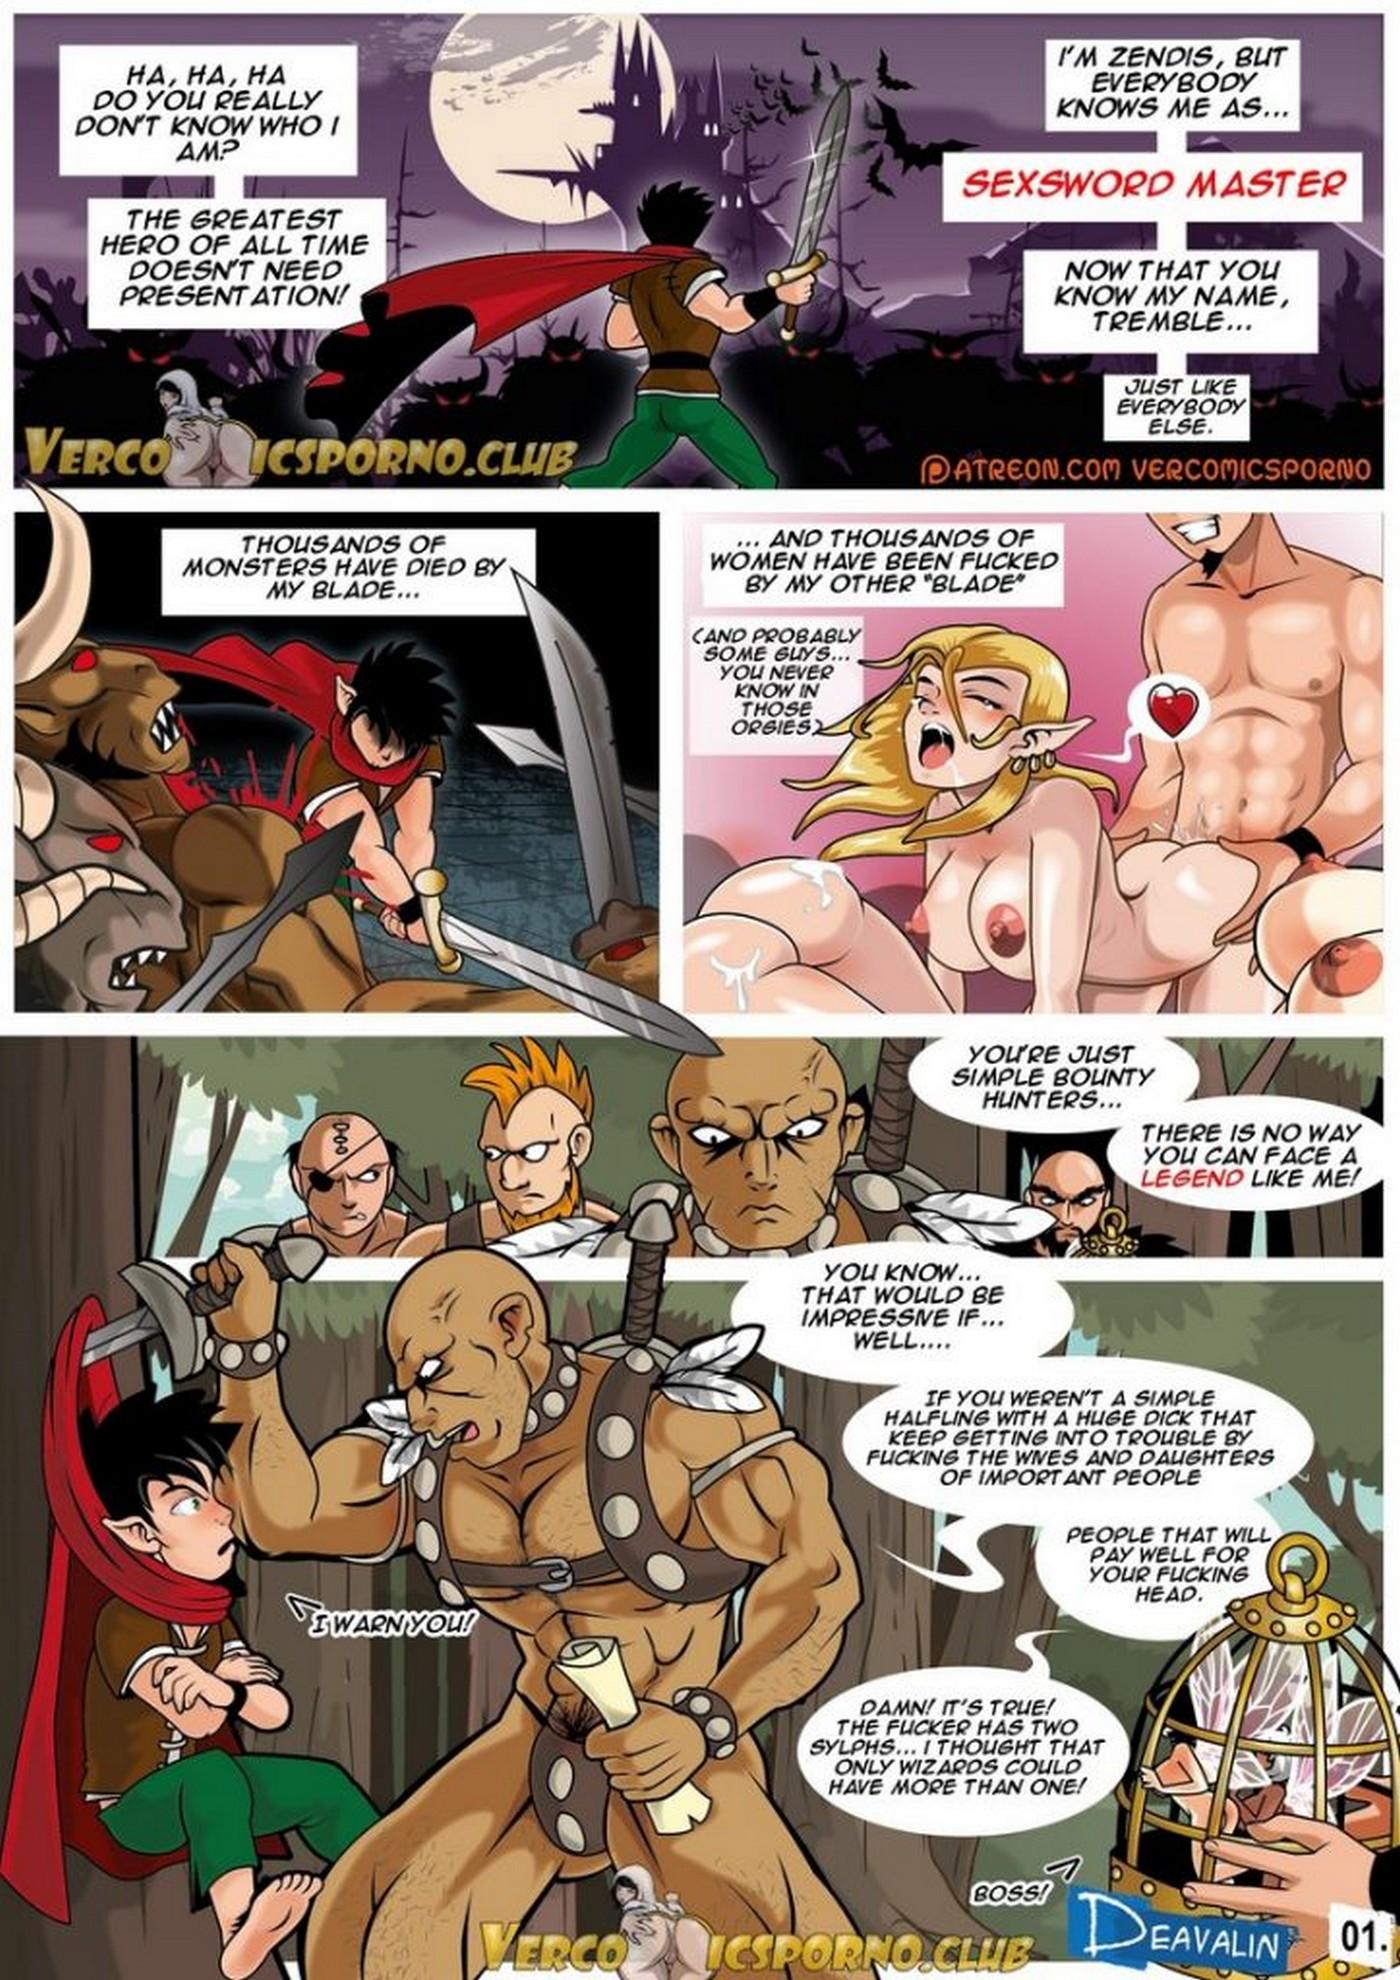 Sexsword Legends Deavalin 02